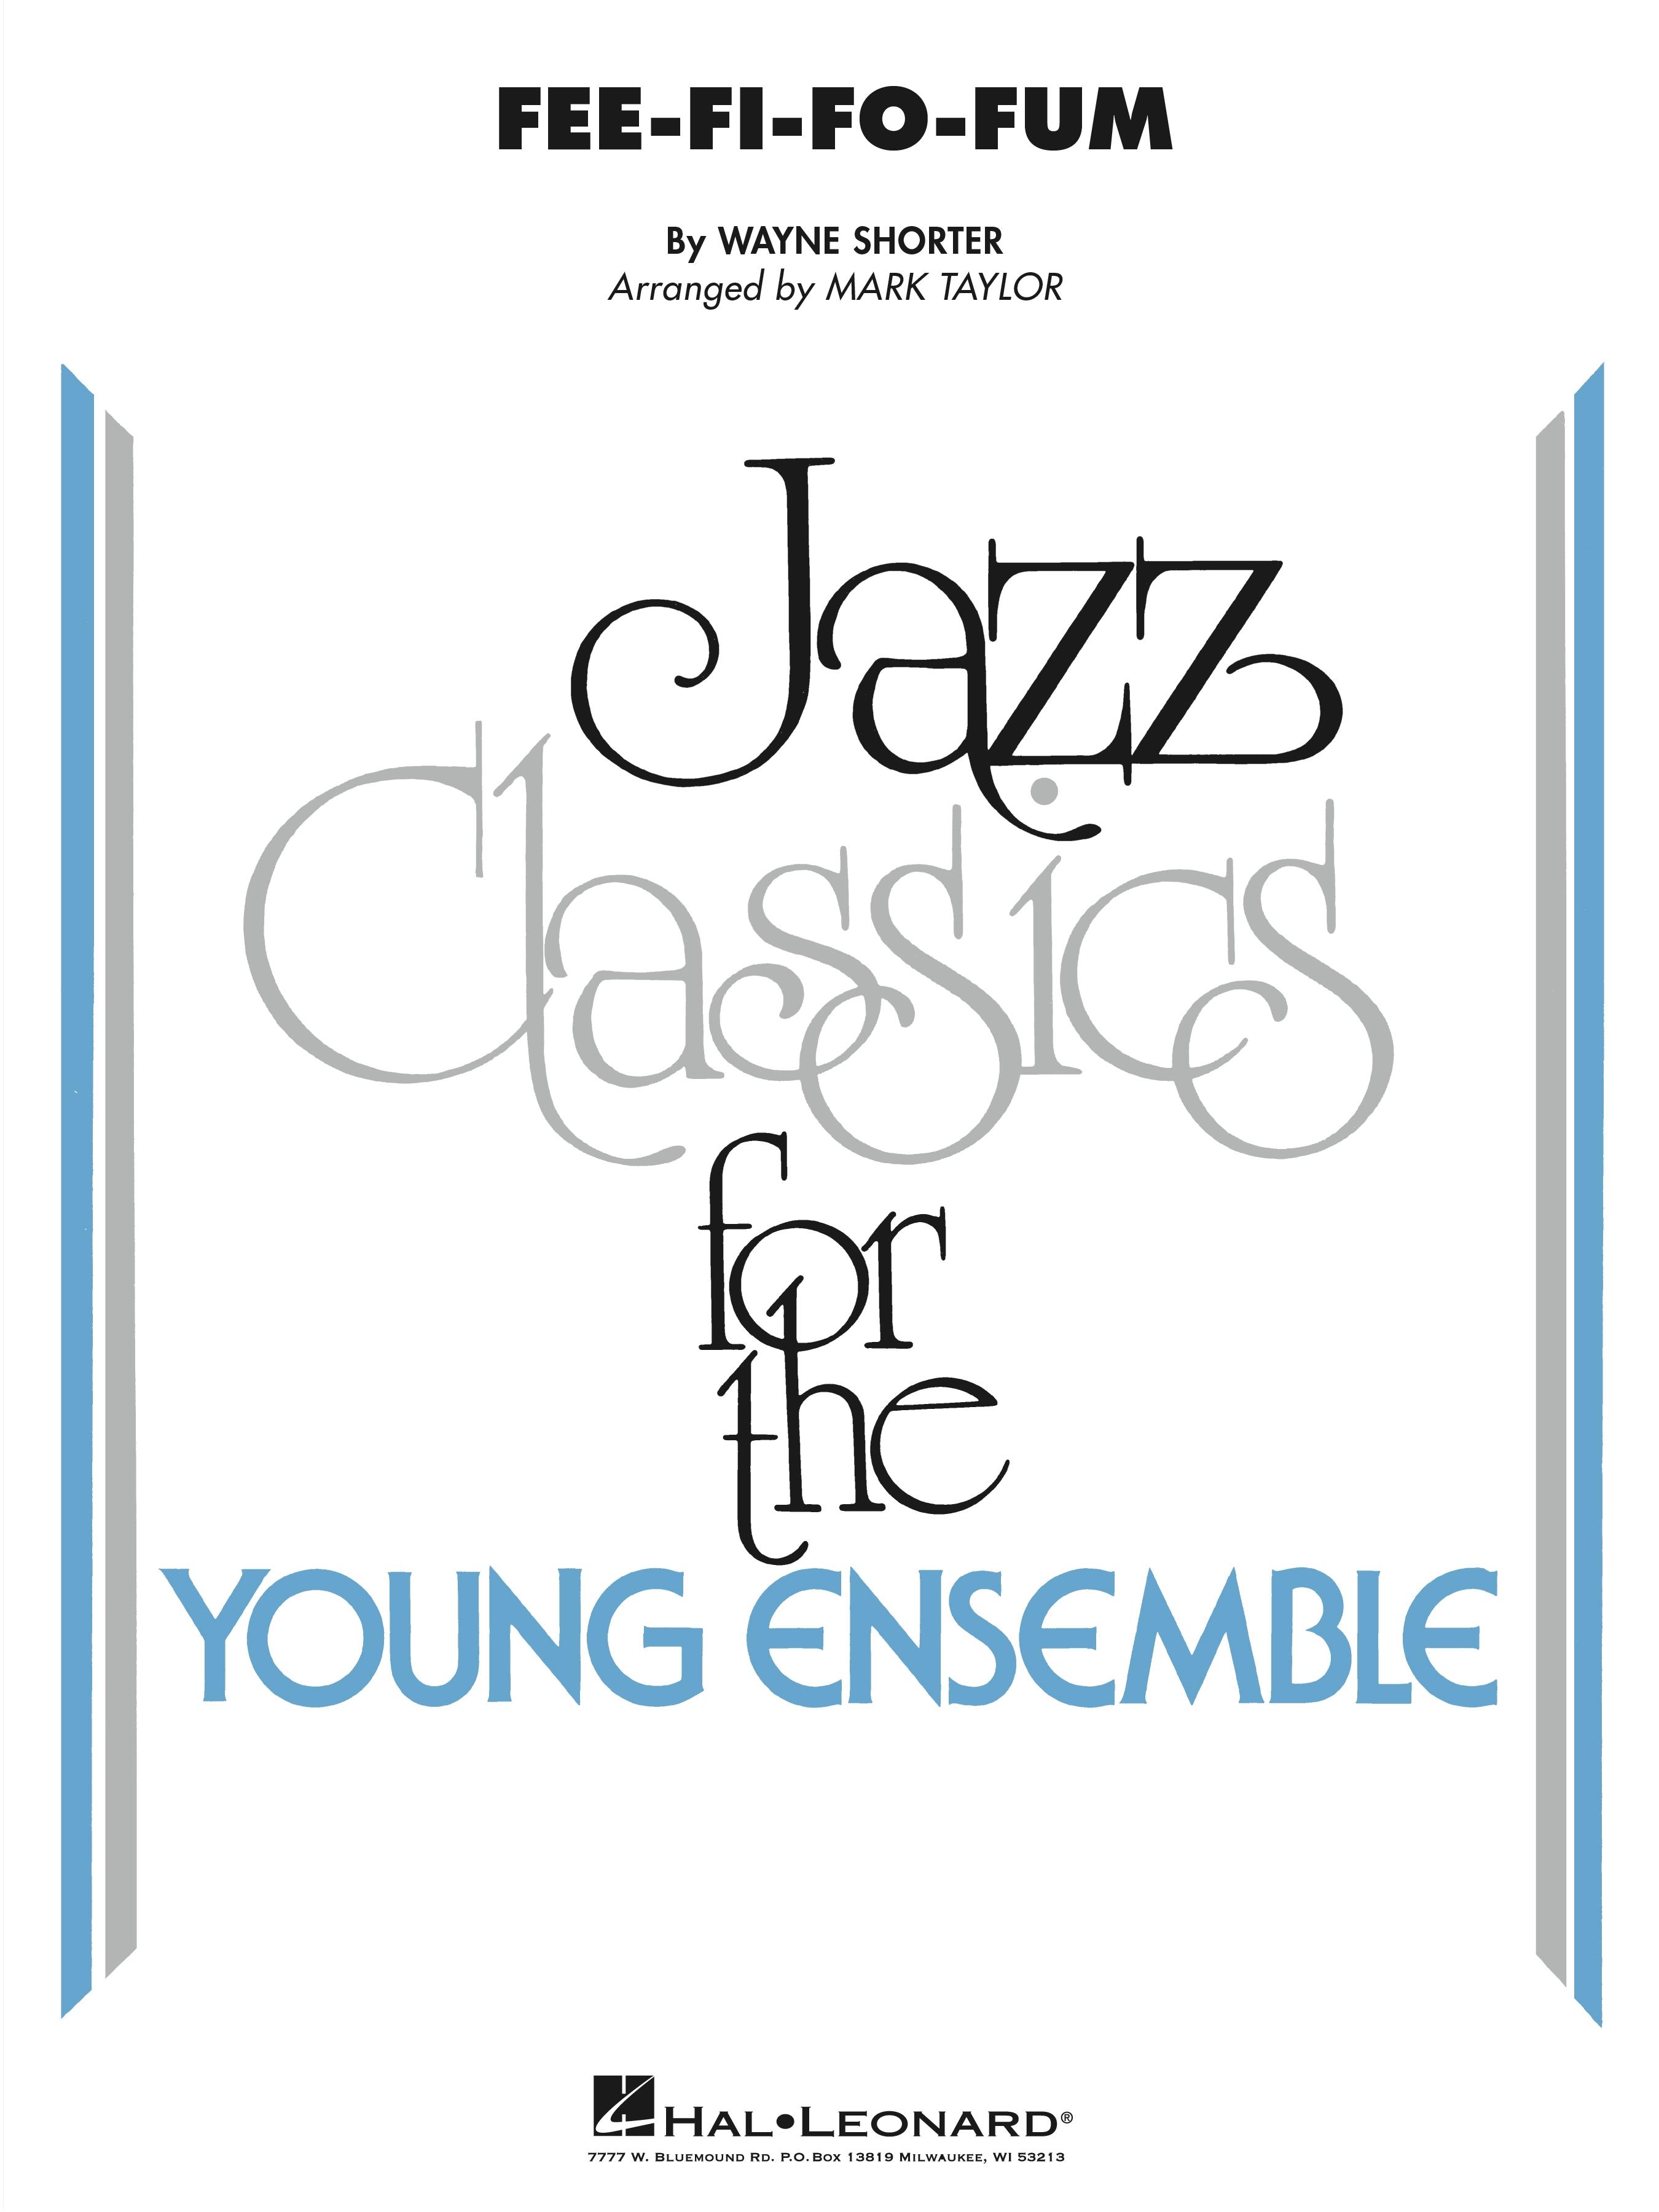 Fee-Fi-Fo-Fum jazz sheet music cover